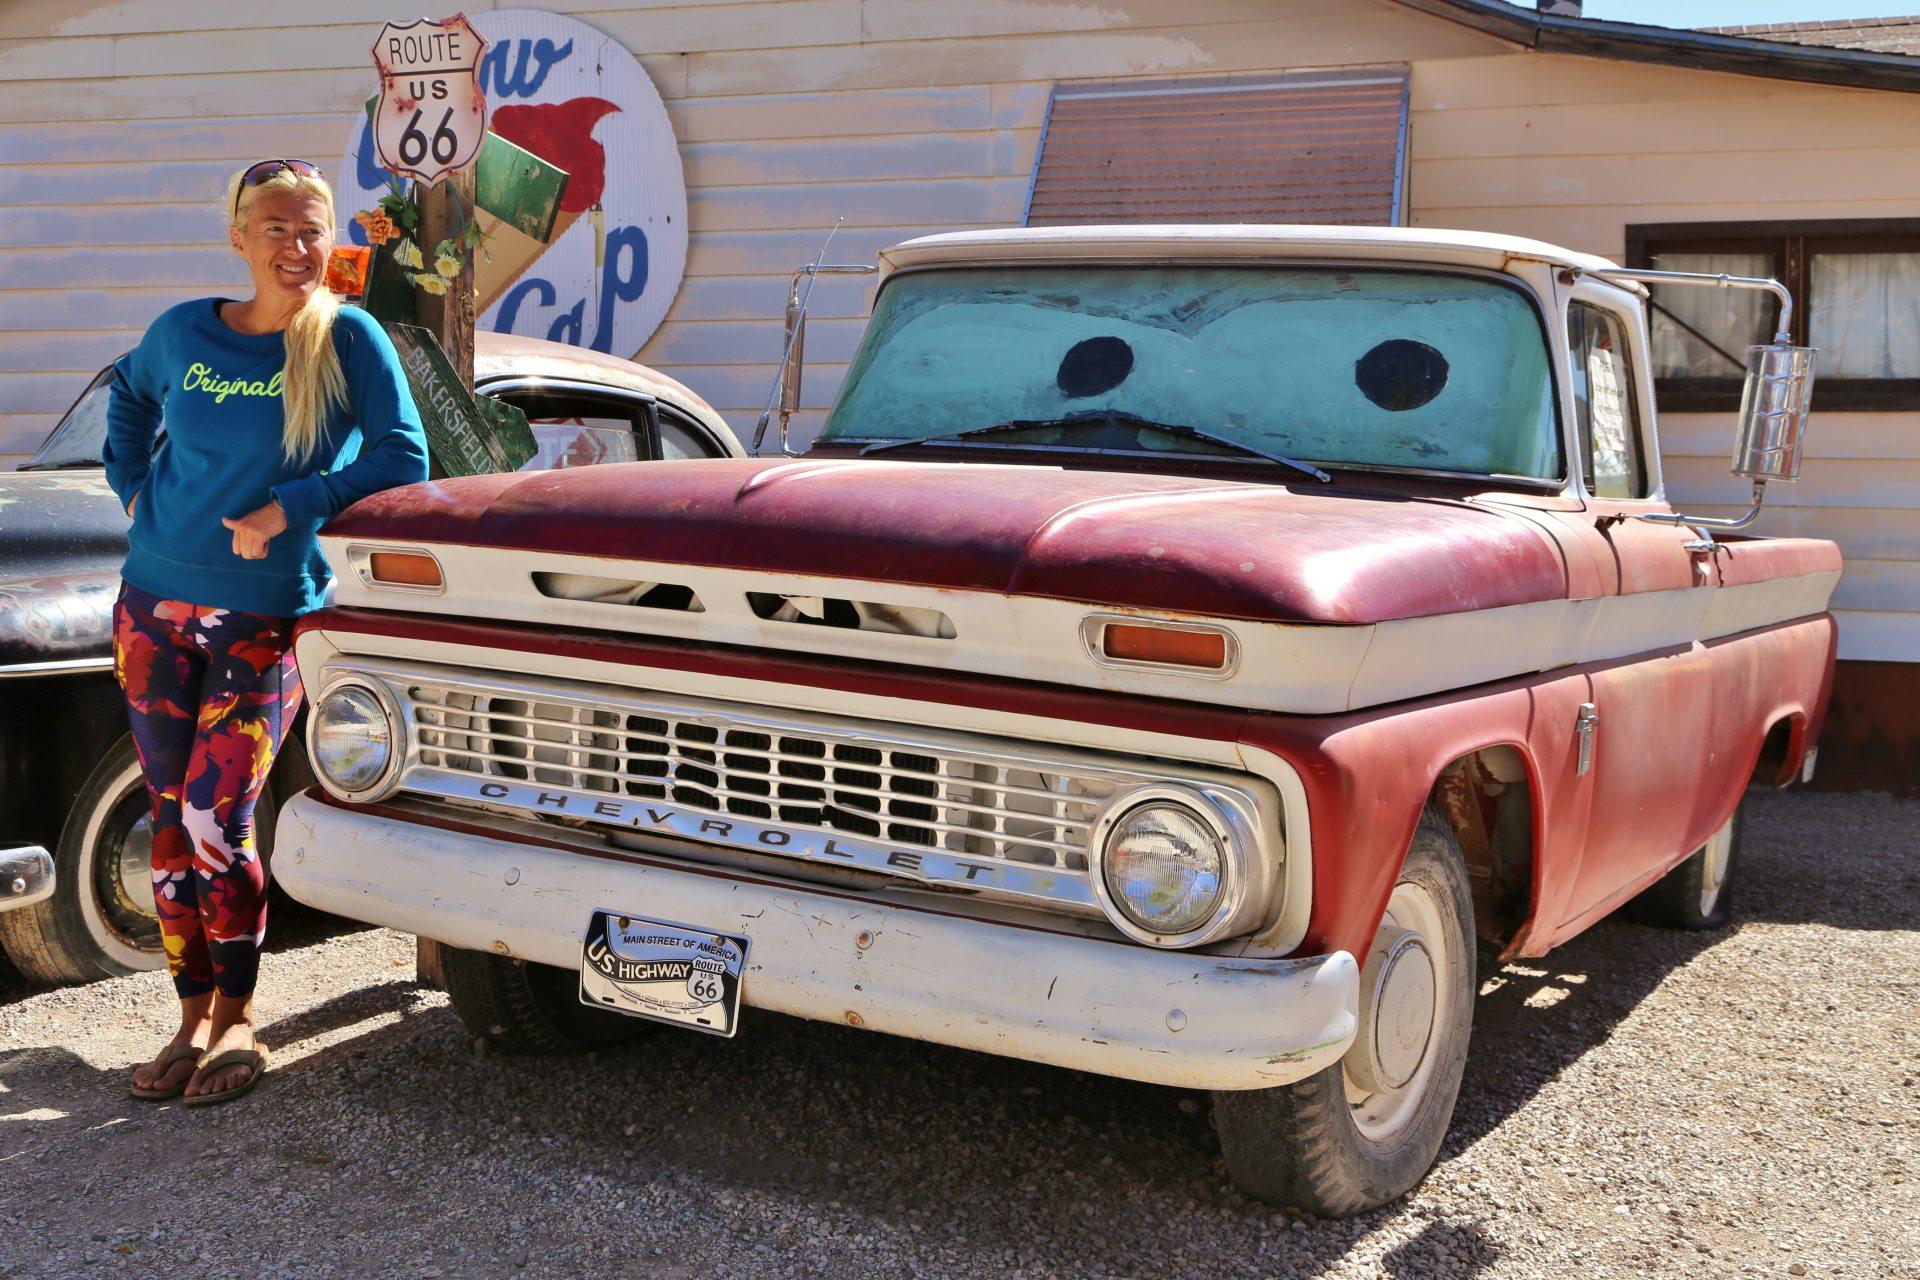 Freiluftmuseum Route 66 Seligman - Arizona, Auto, Blondine, Chevrolet, Fahrzeug, Oldtimer, Personen, Pickup, Pickup Truck, Portrait, Porträt, Route 66, Seligman - HOFBAUER-HOFMANN Sofia - (Seligman, Arizona, Vereinigte Staaten)